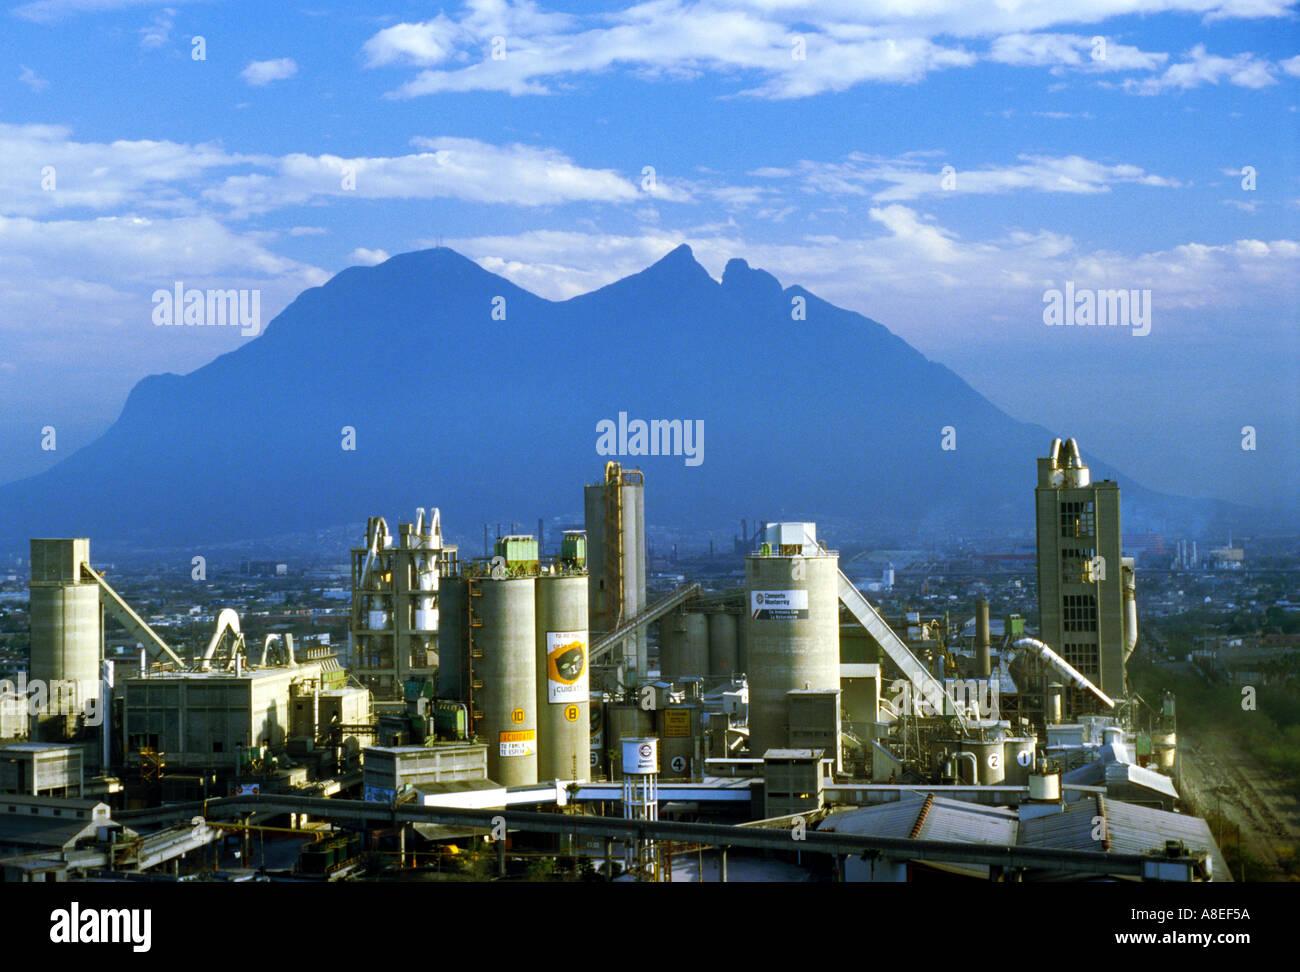 Idaho Cement Plants : The cemex cement plant in monterrey nuevo leon mexico